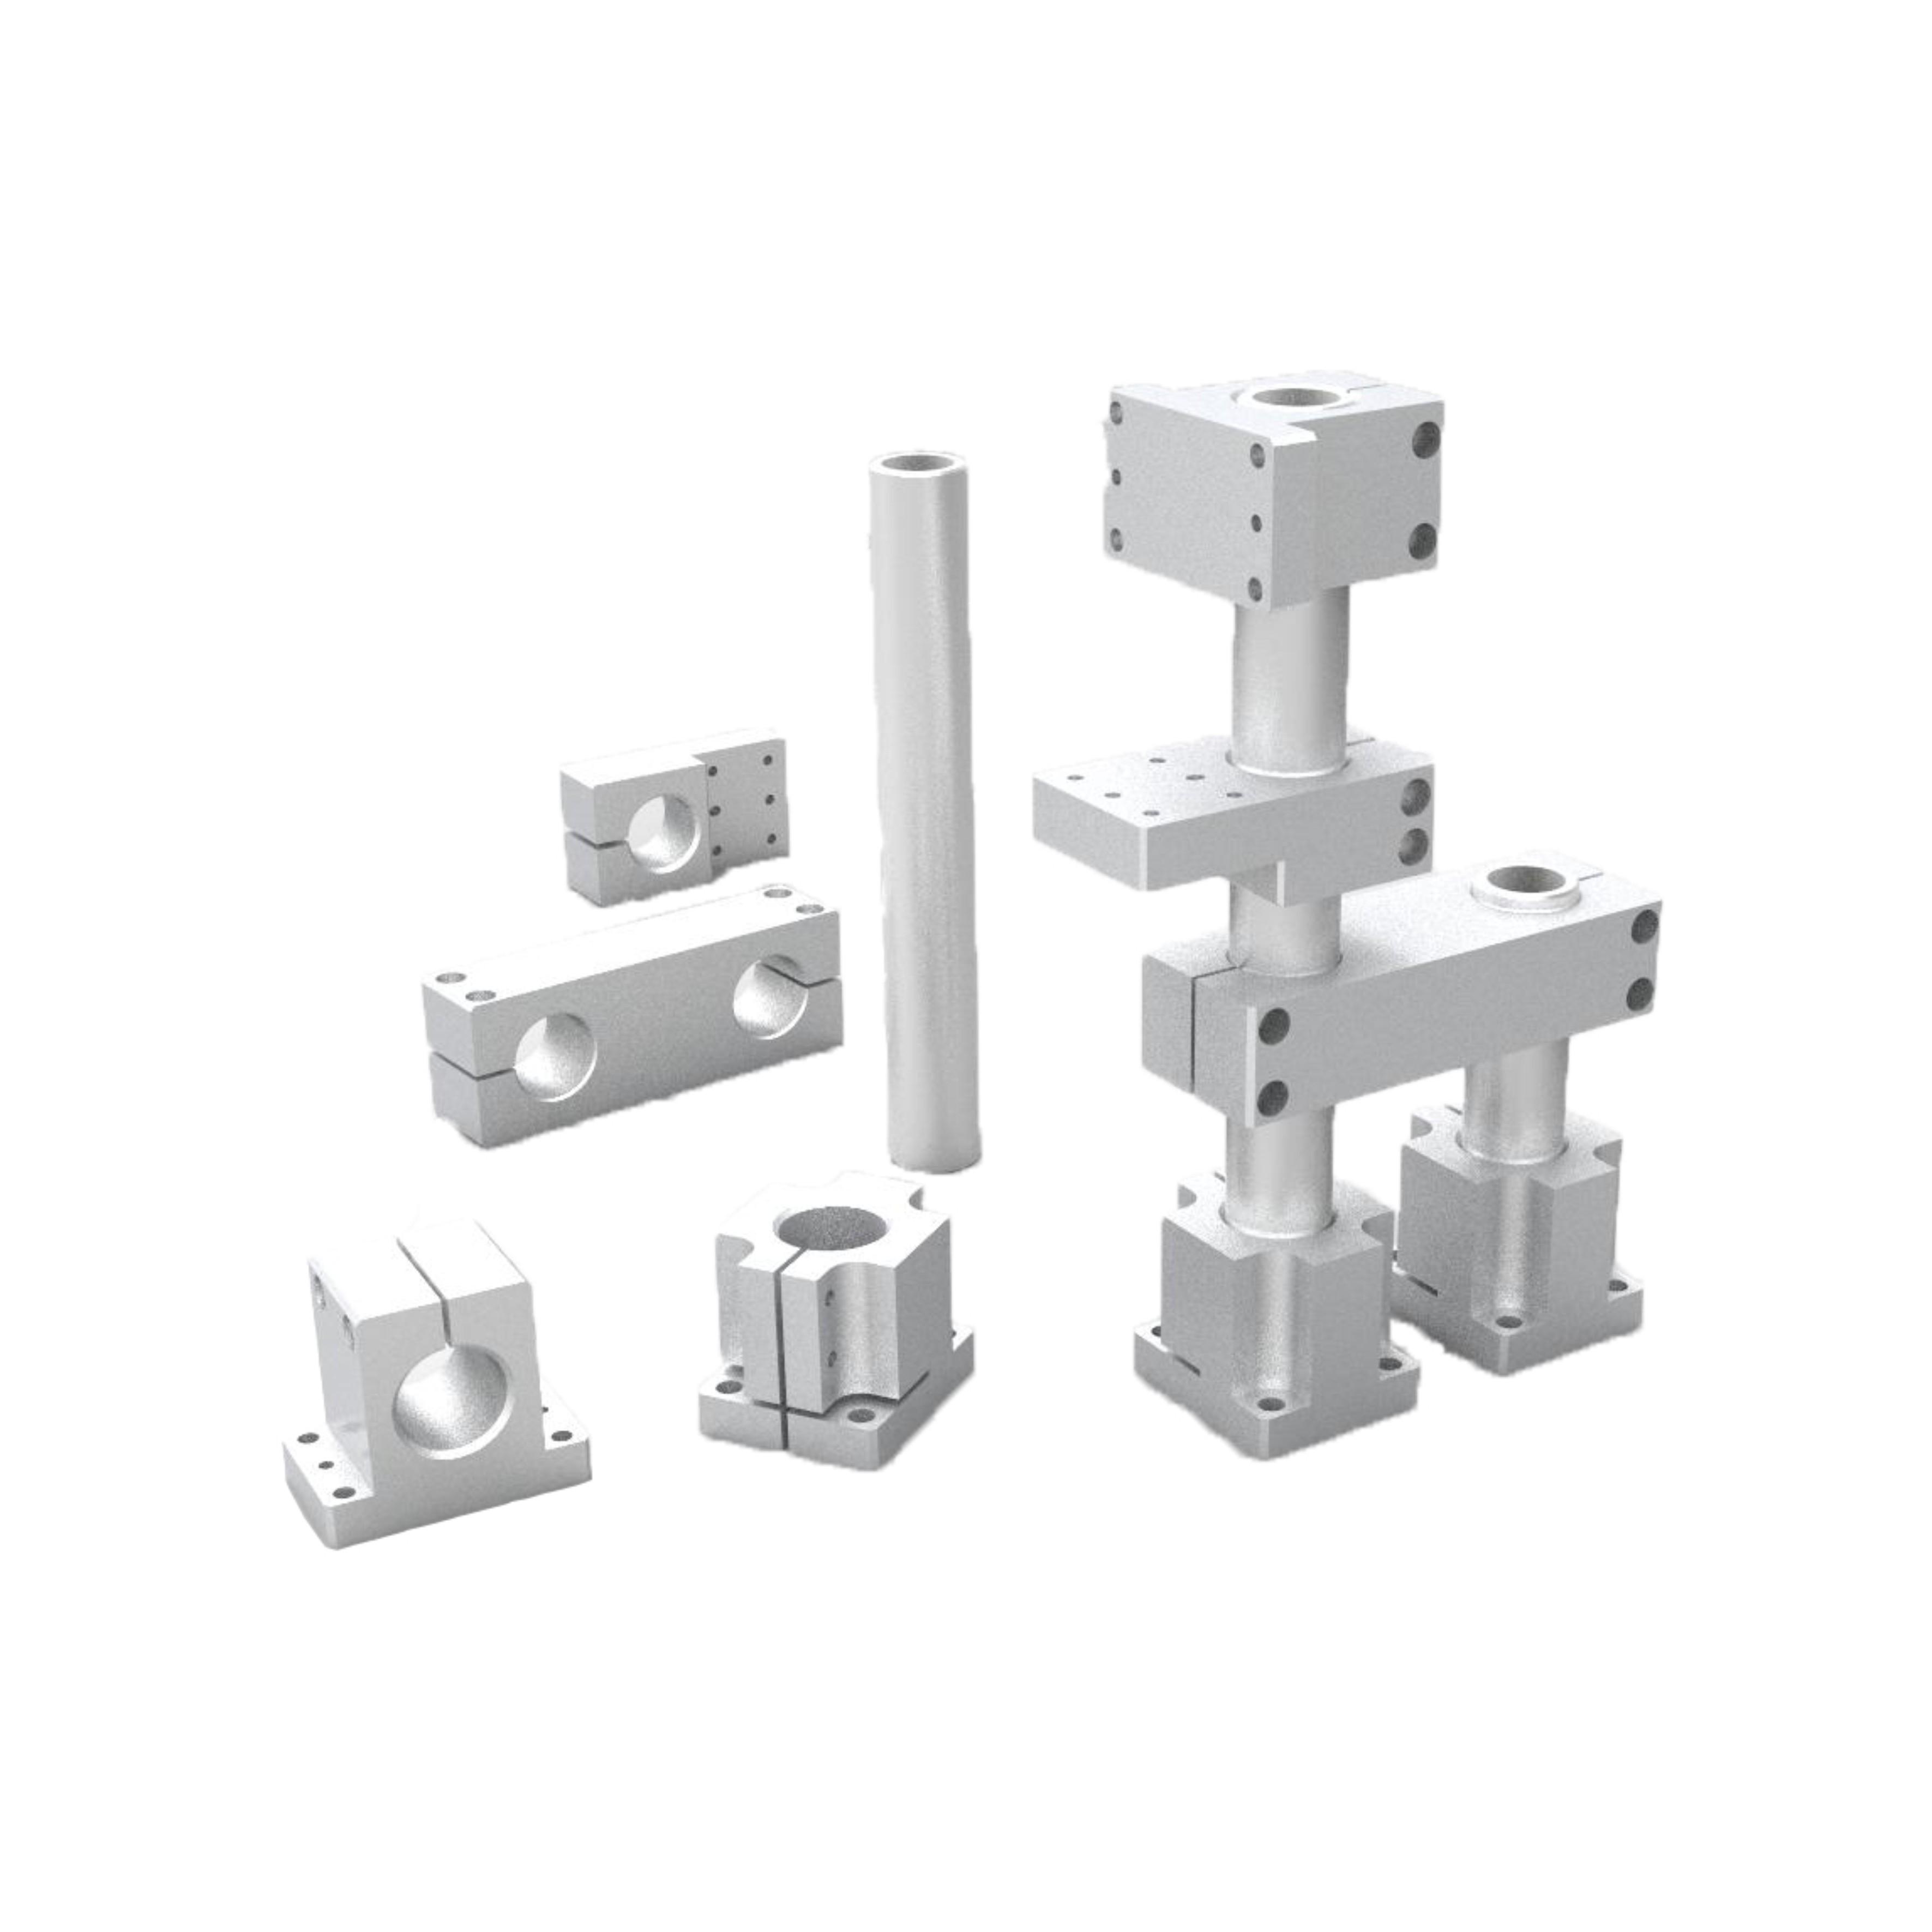 ZCD01-16机构安装组件 底座/立柱/锁块/加强块/平行锁块